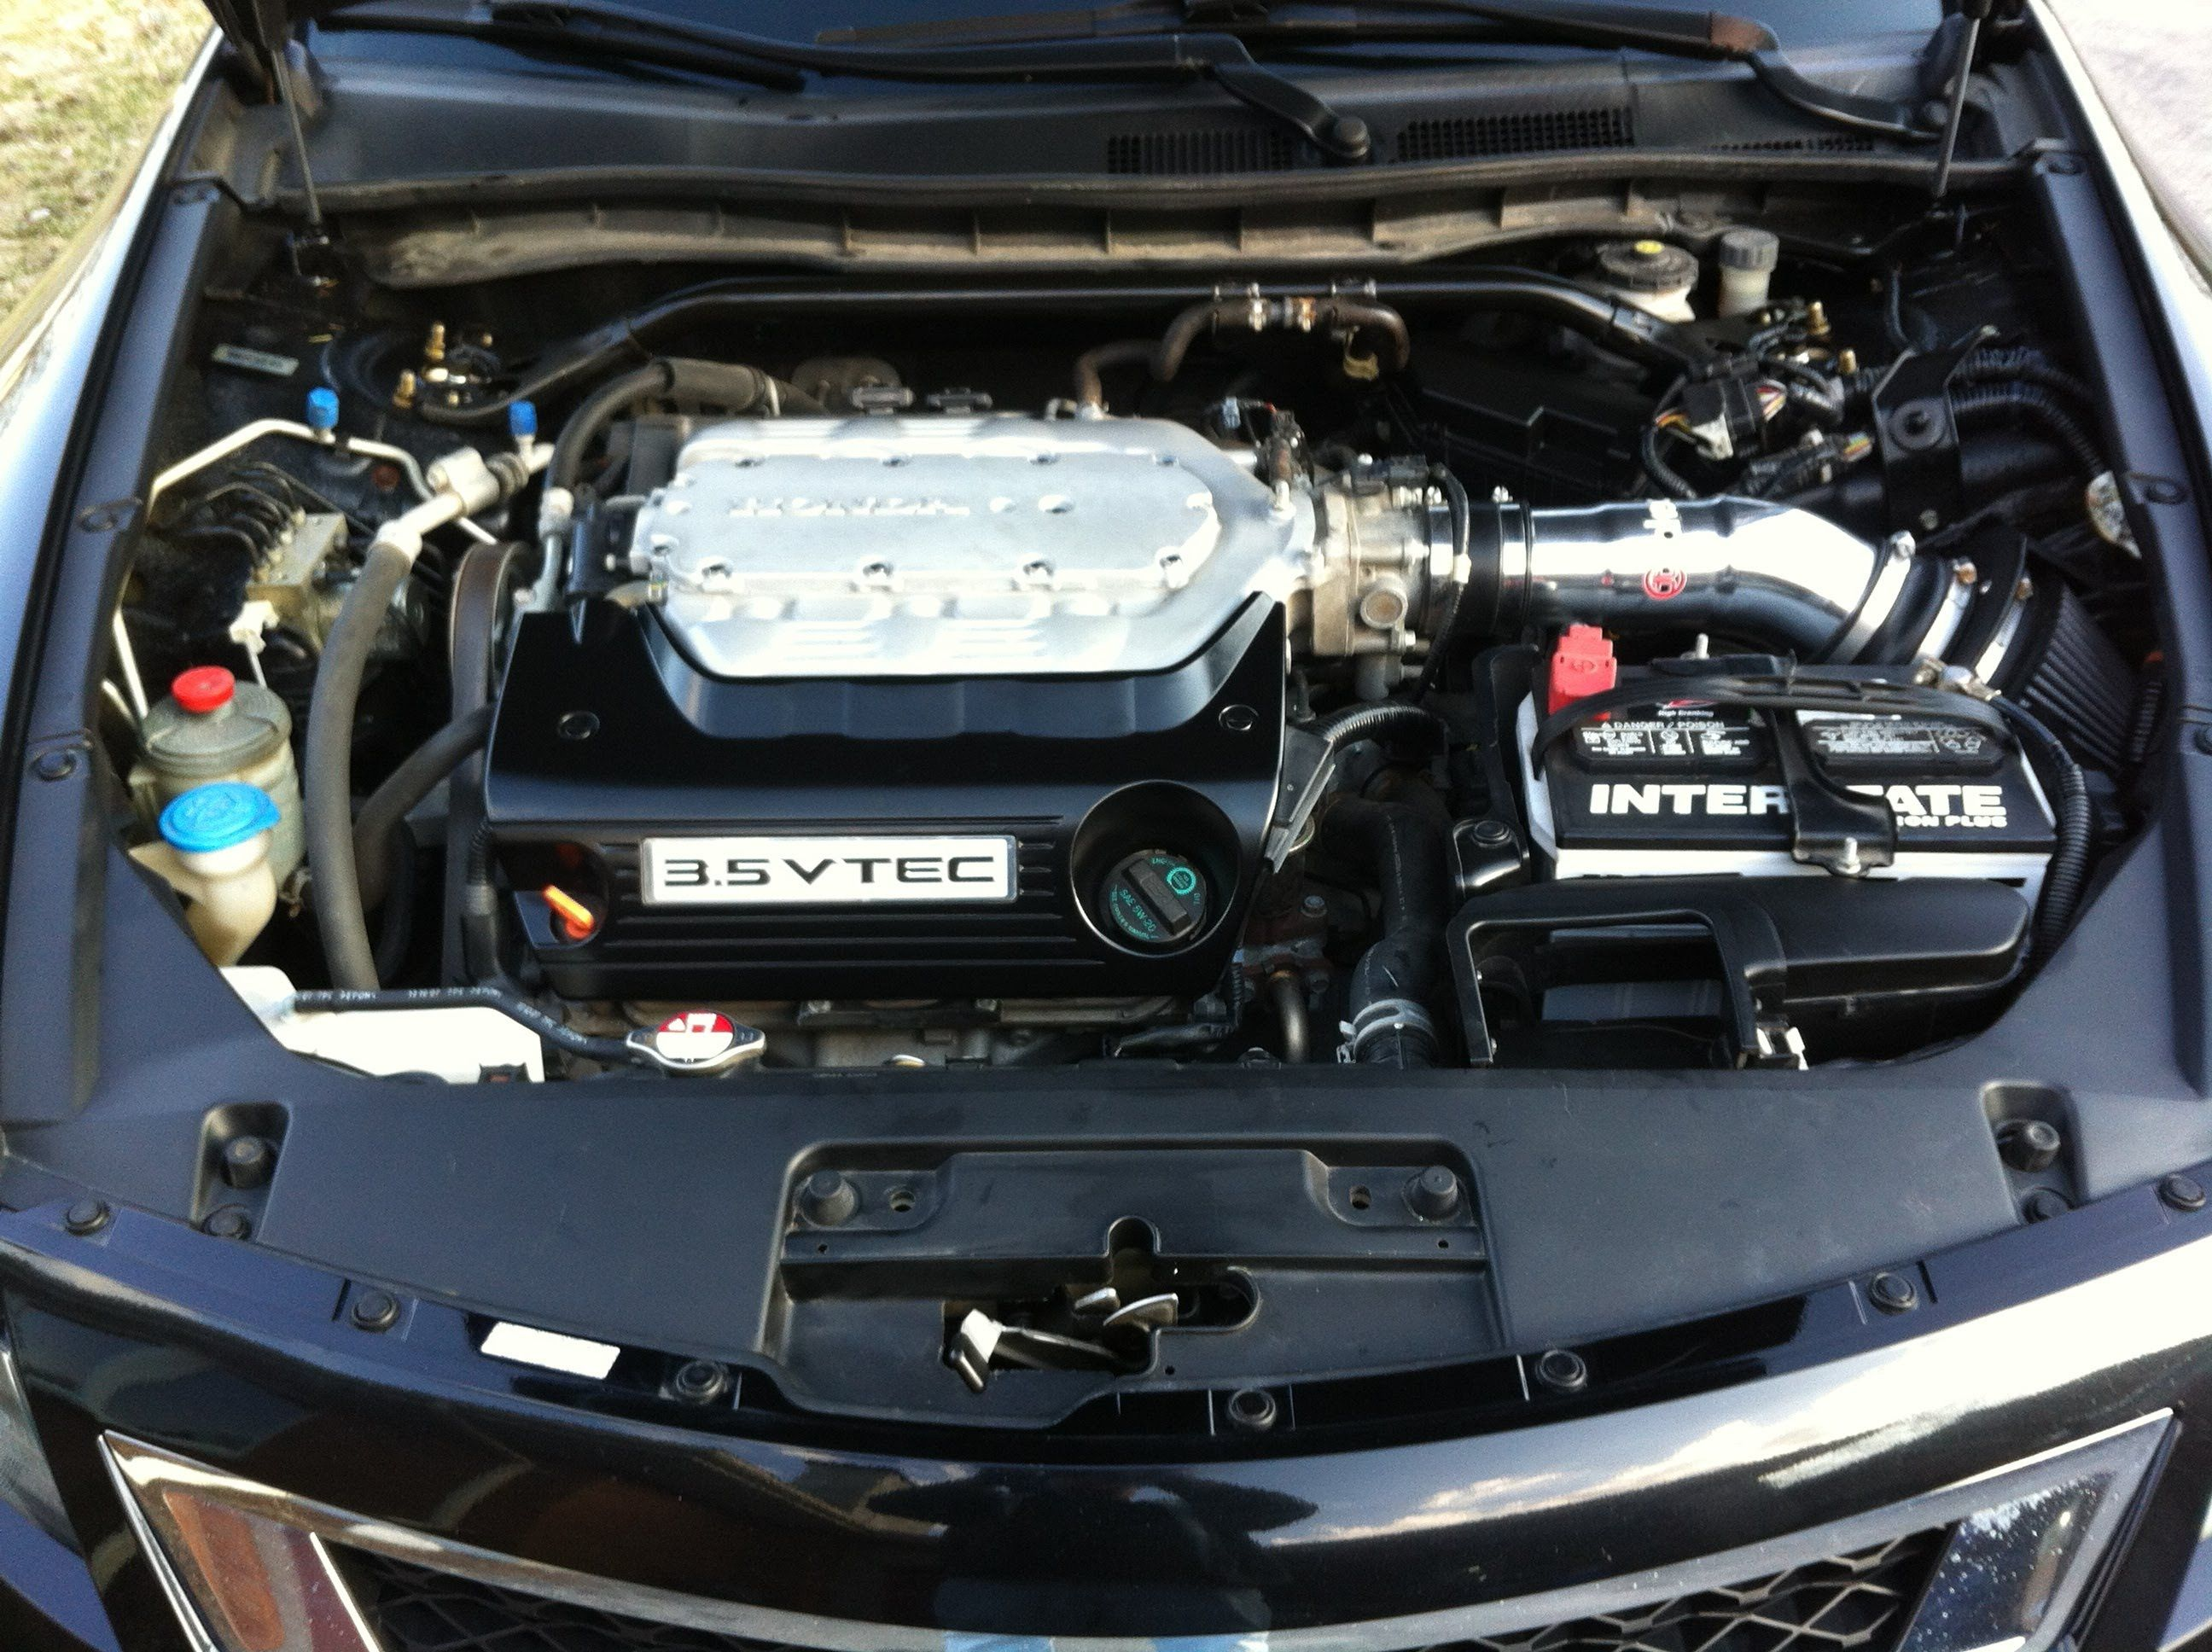 2008 Honda Accord V6 | Takeda Short Ram Intake before and after install